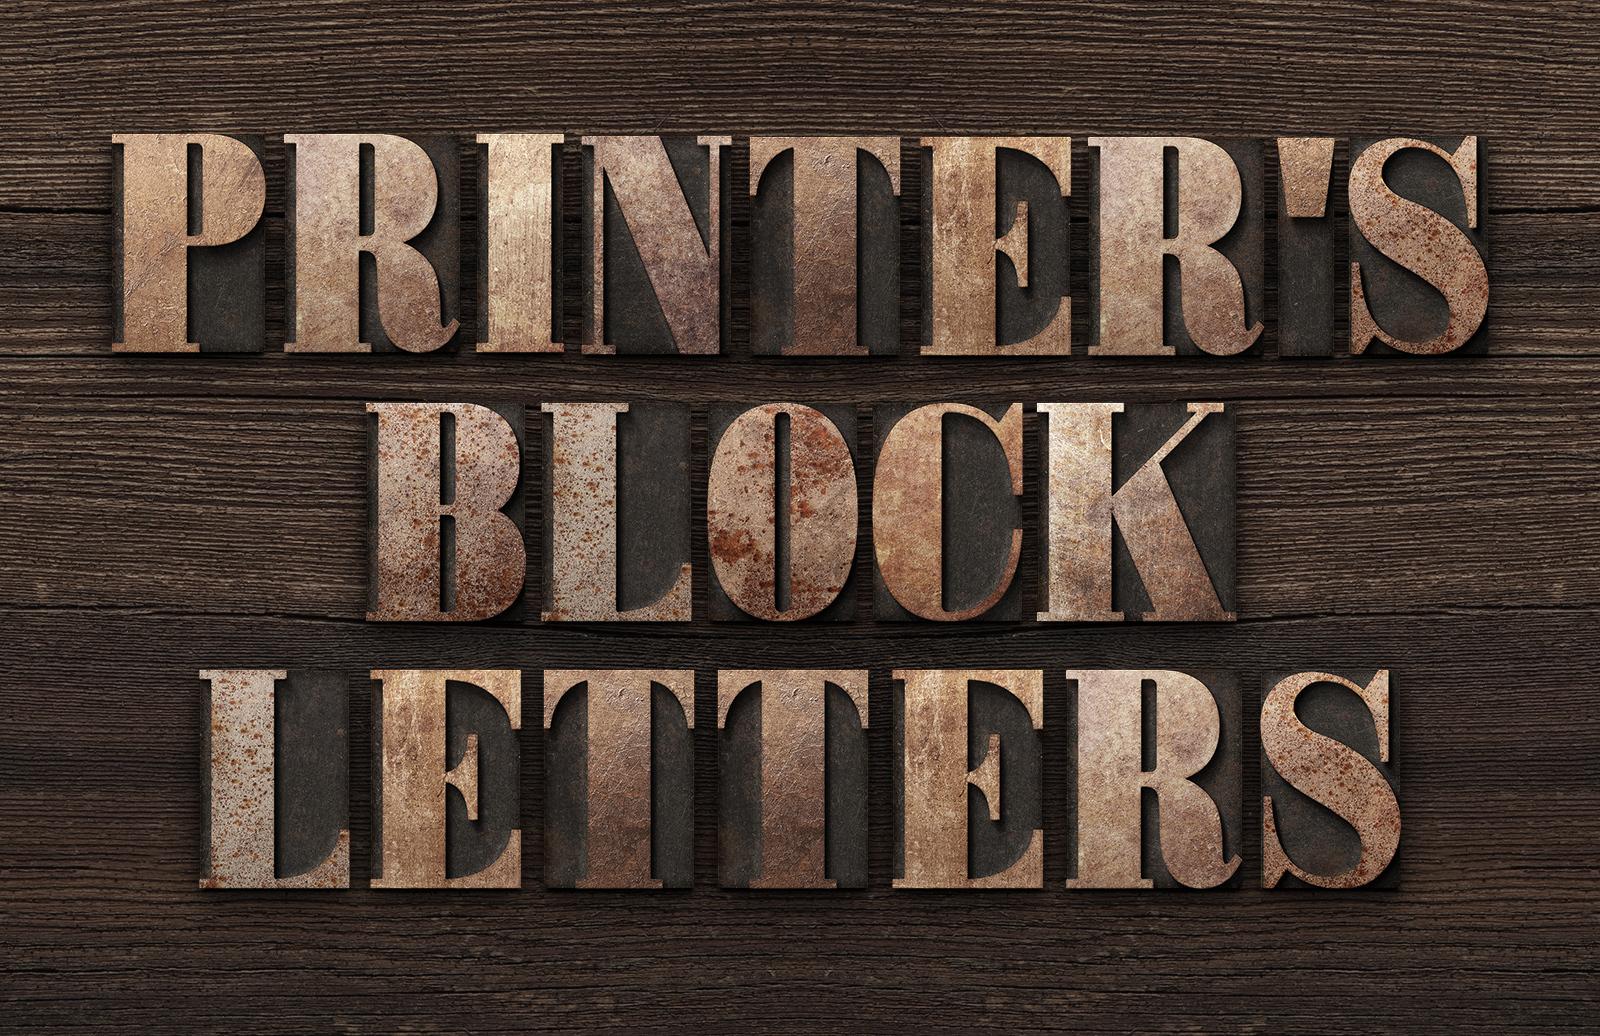 Printer's Letterpress Block Letters